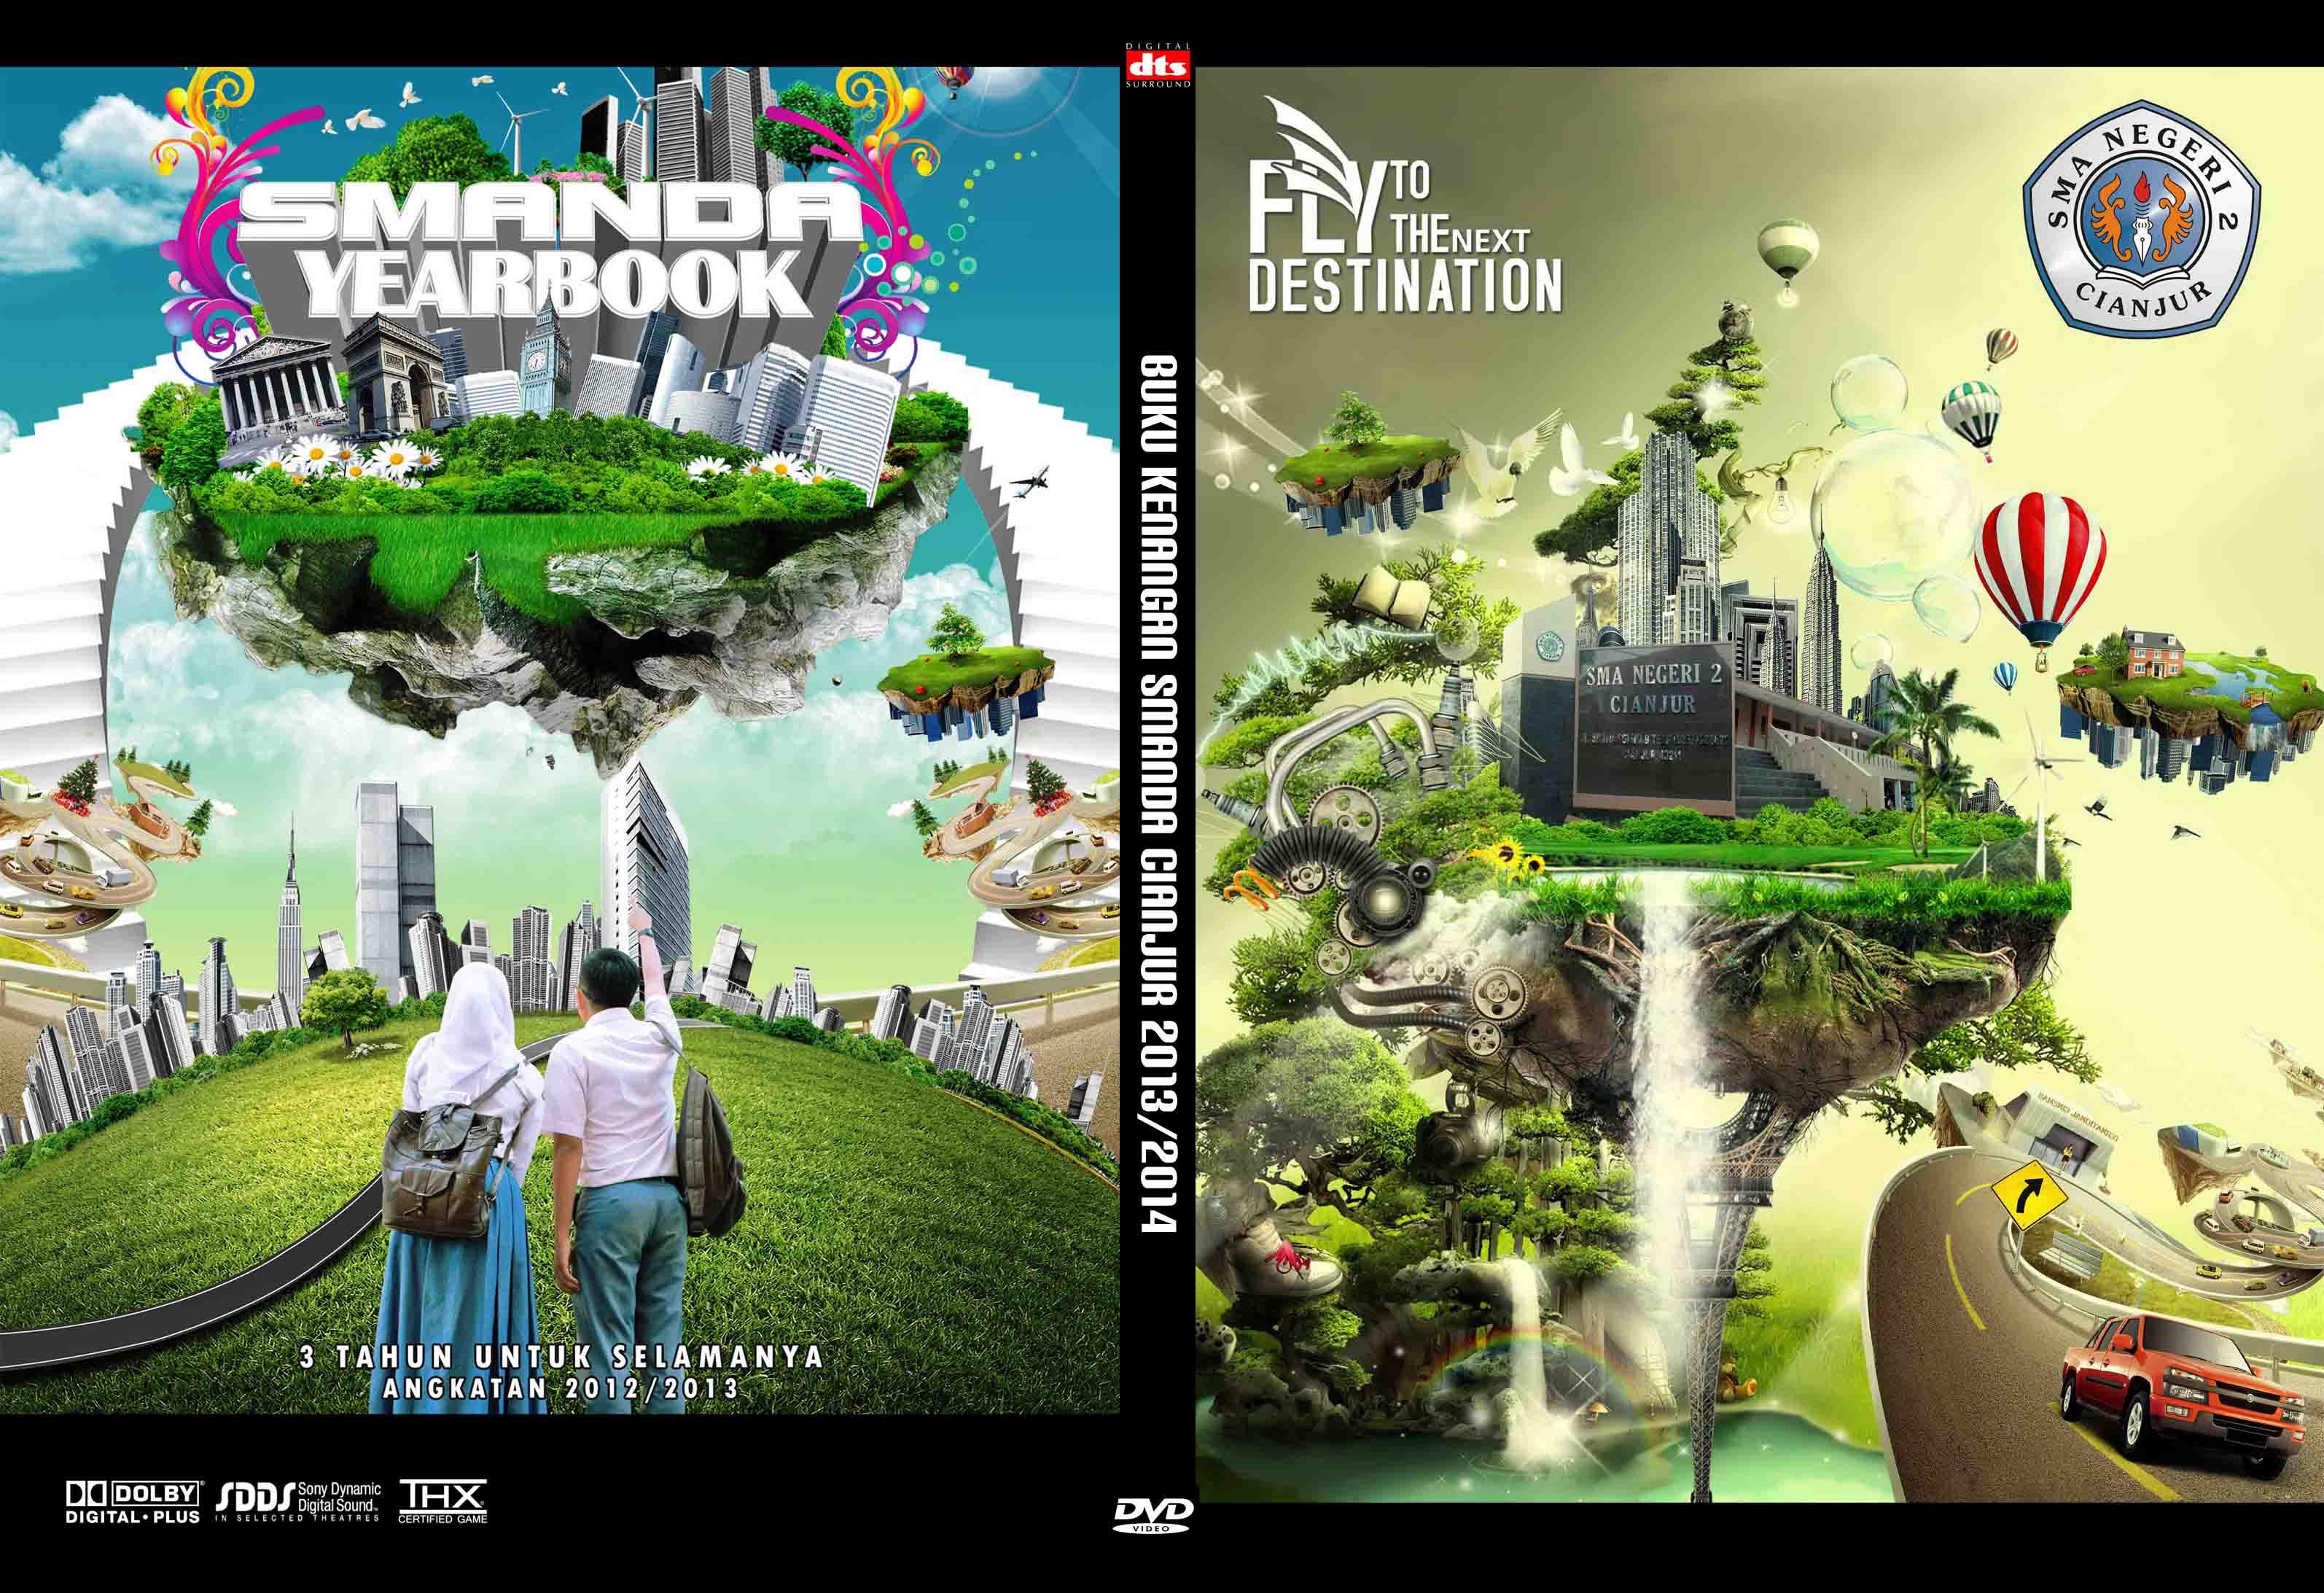 cover kaset DVD12 cover kaset DVD12